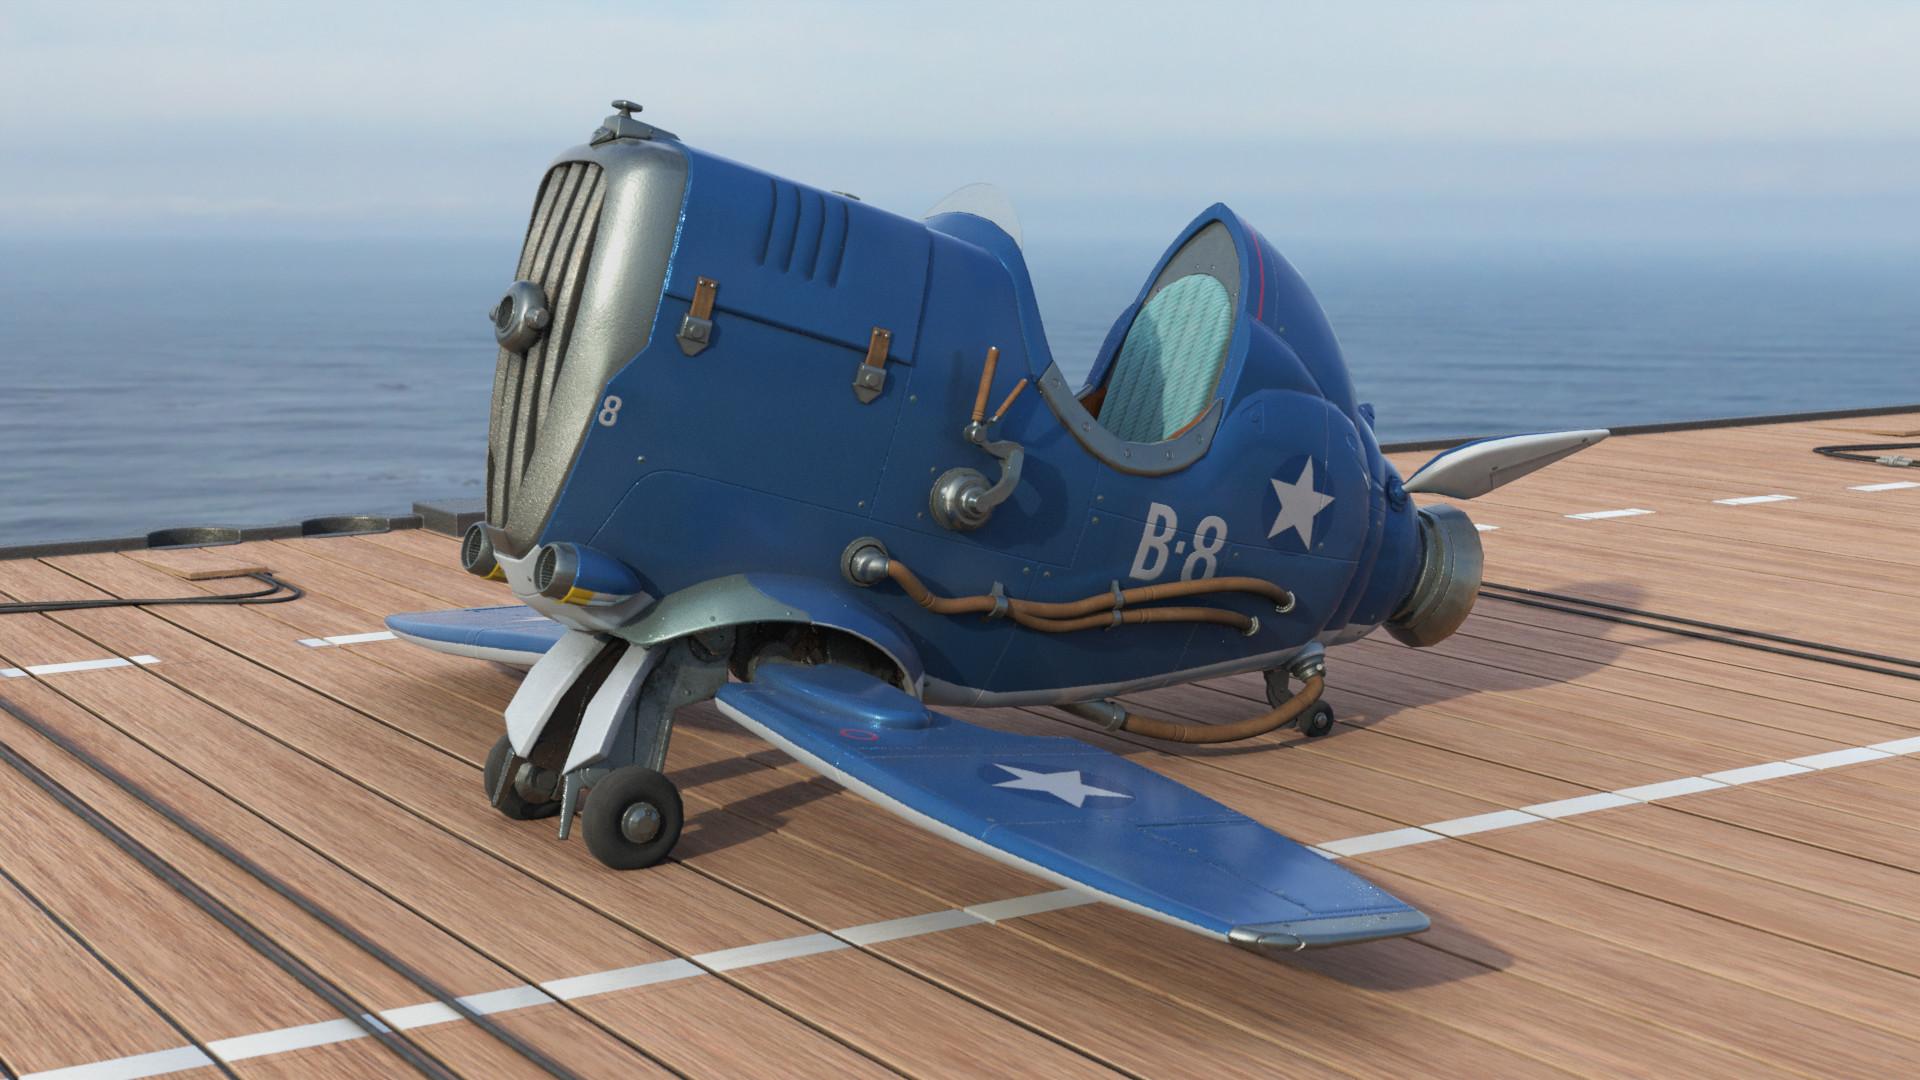 John griffiths seaplane wingsout render 01